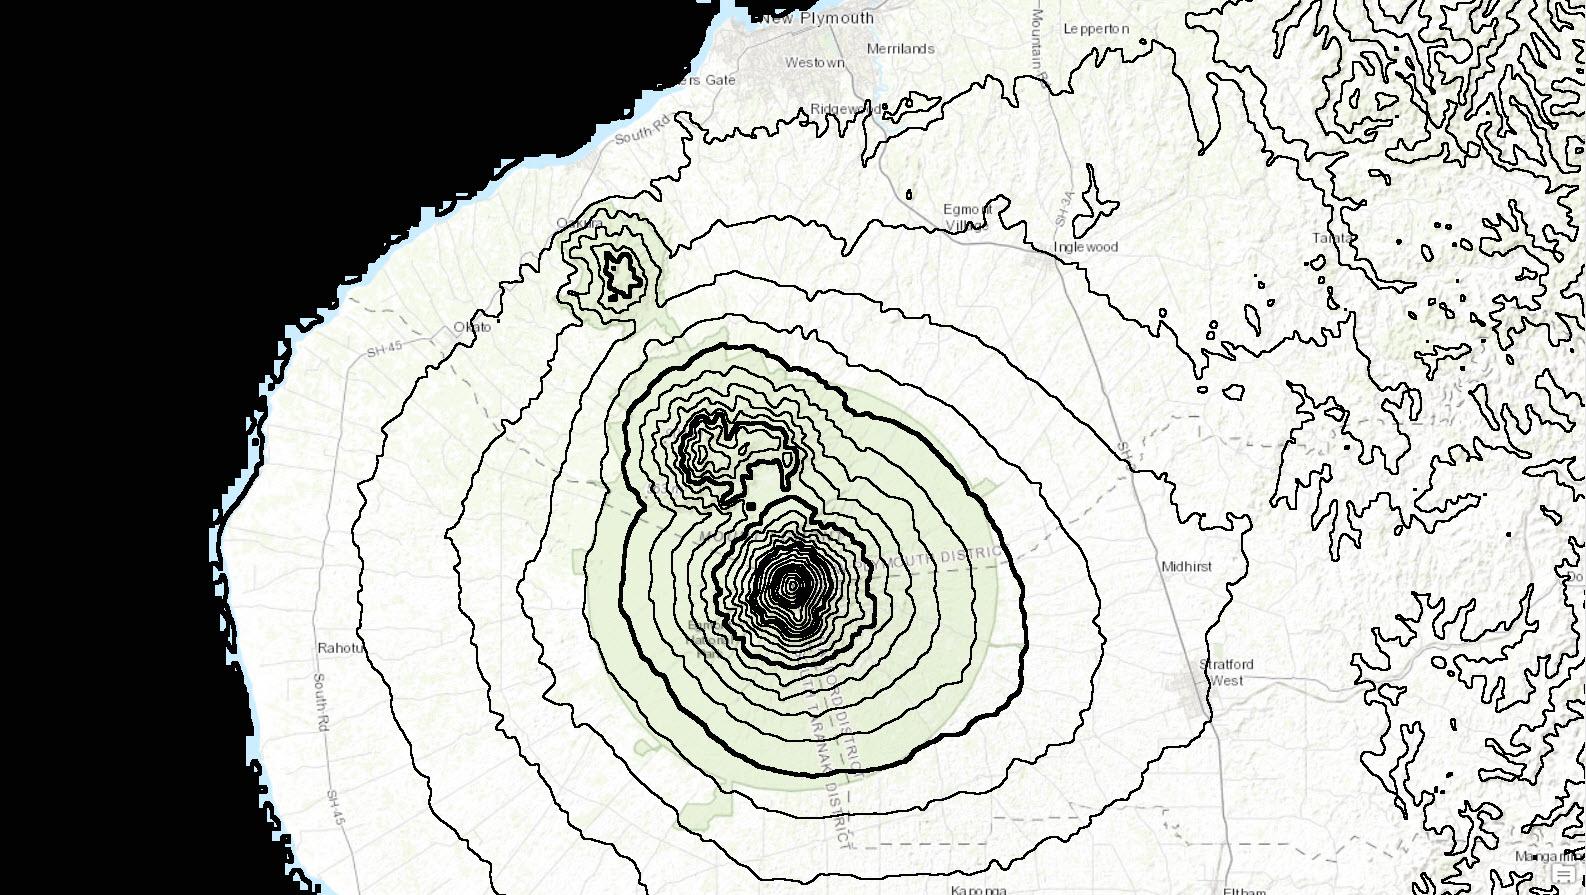 Taranaki contour map